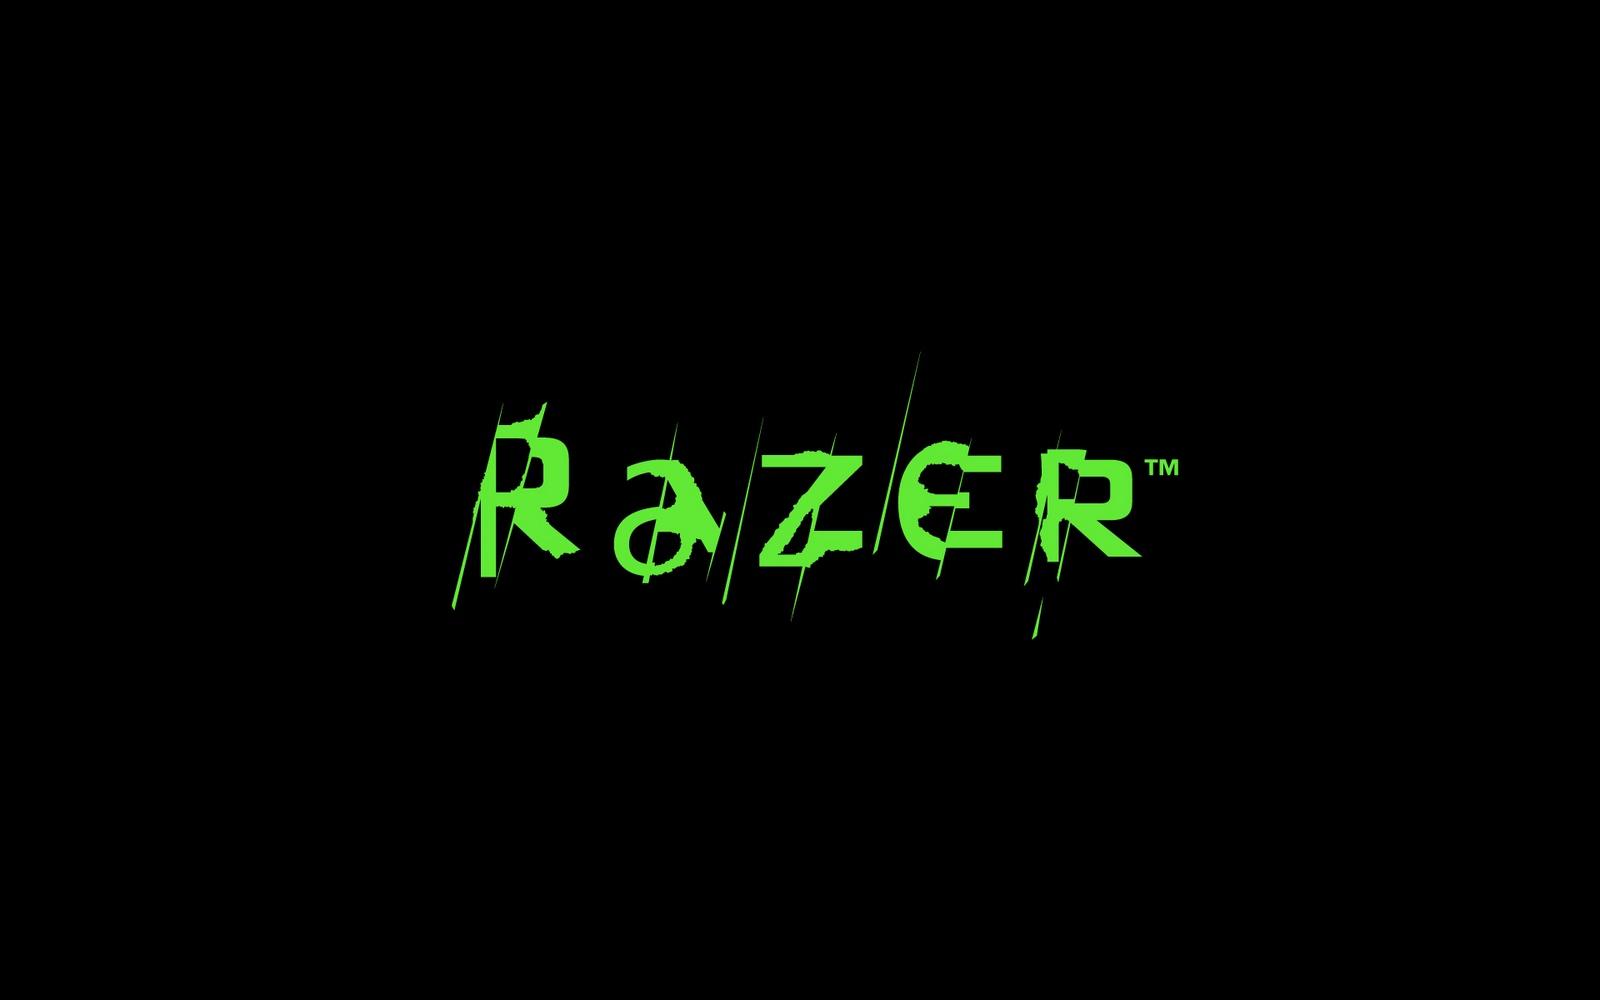 Razer Wallpapers 1600x1000